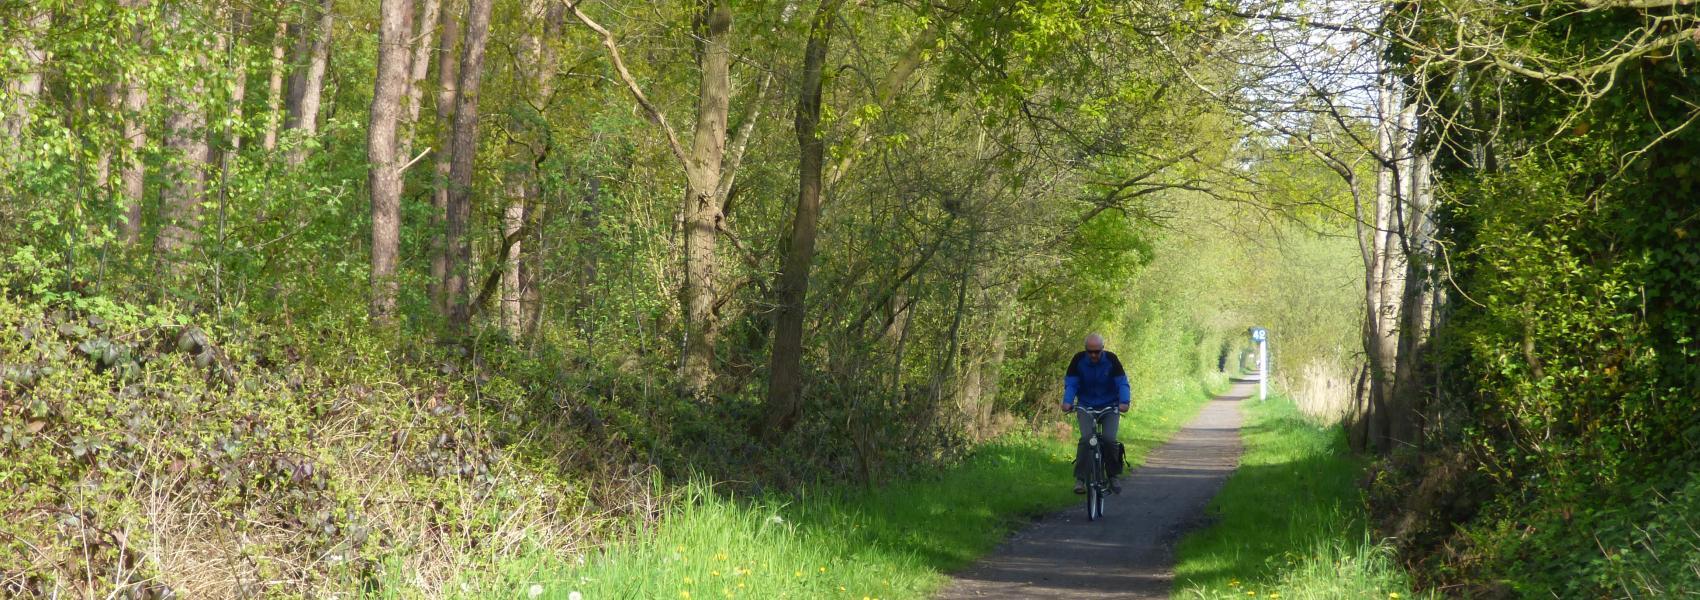 fietser in de dreef